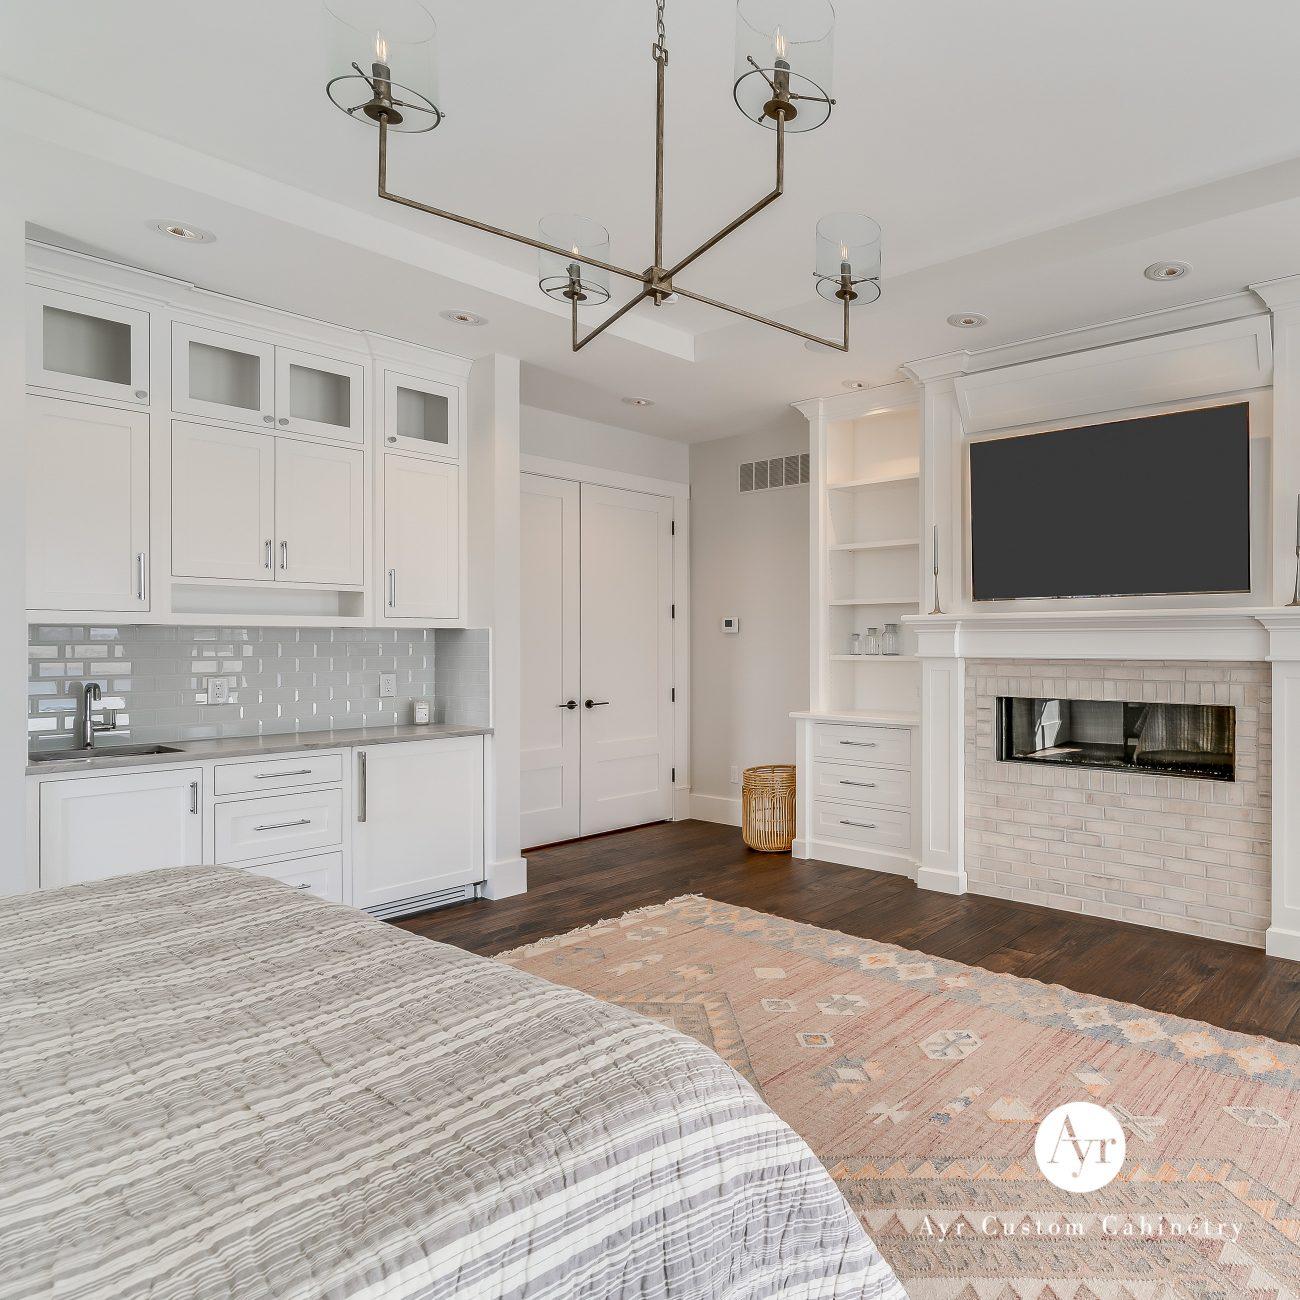 custom bedroom cabinets staley bedroom project